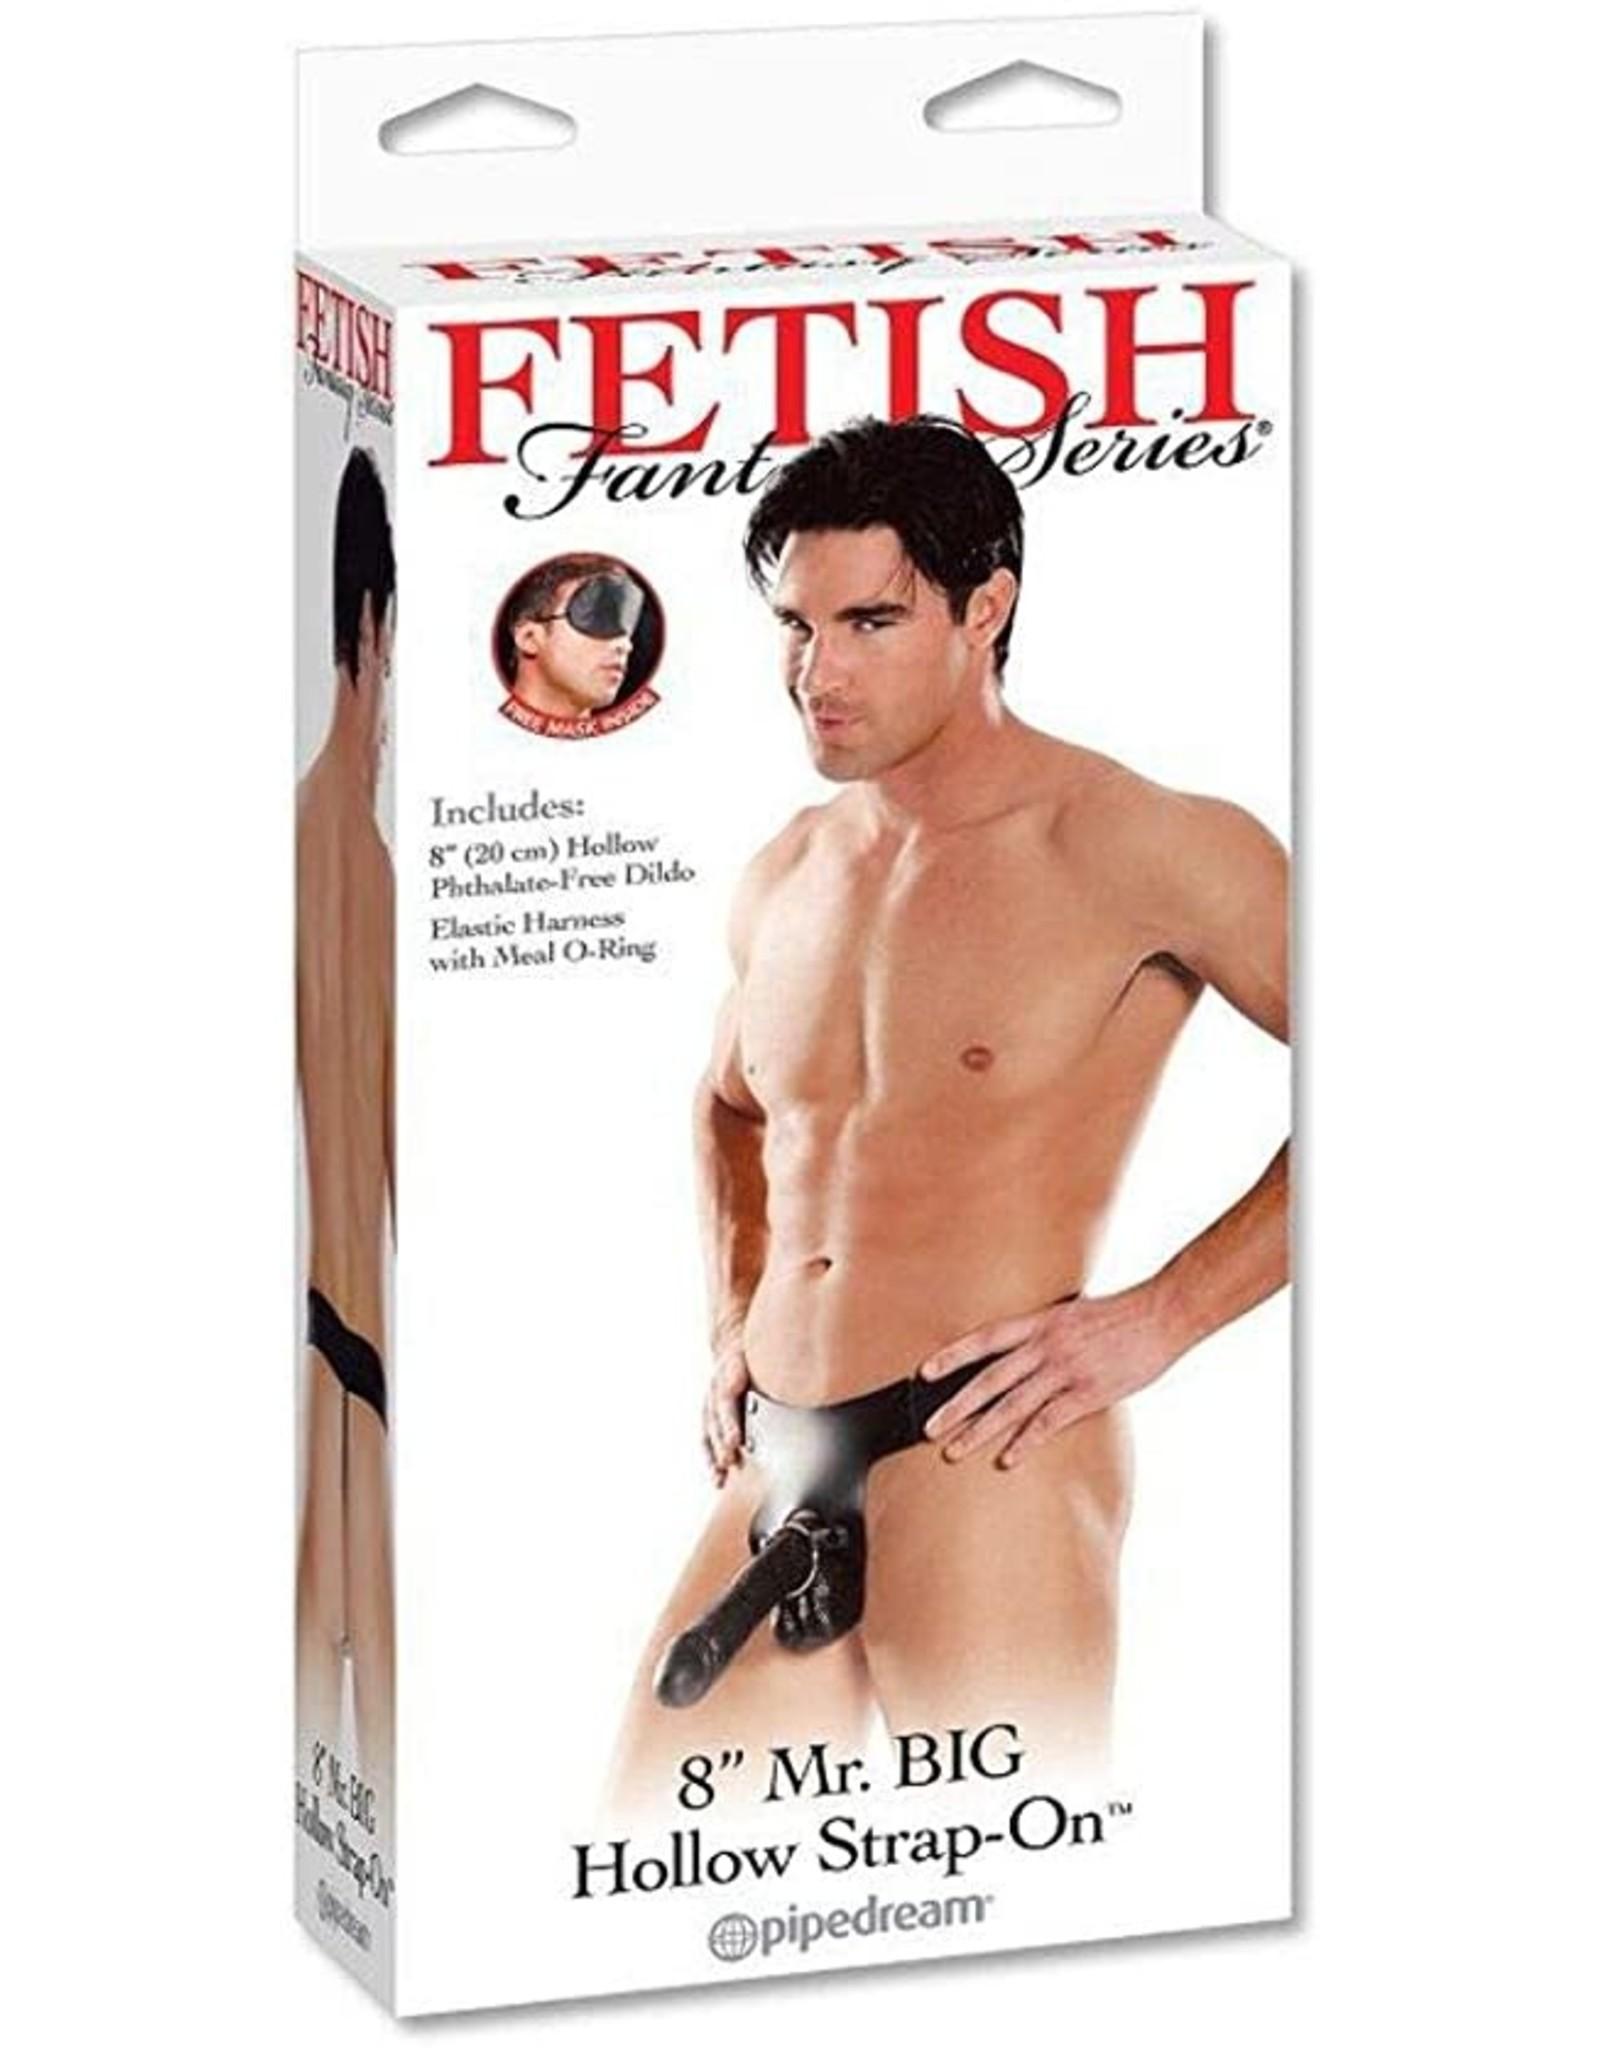 "FETISH FANTASY FETISH FANTASY - MR.BIG 8"" HOLLOW - LICORICE"